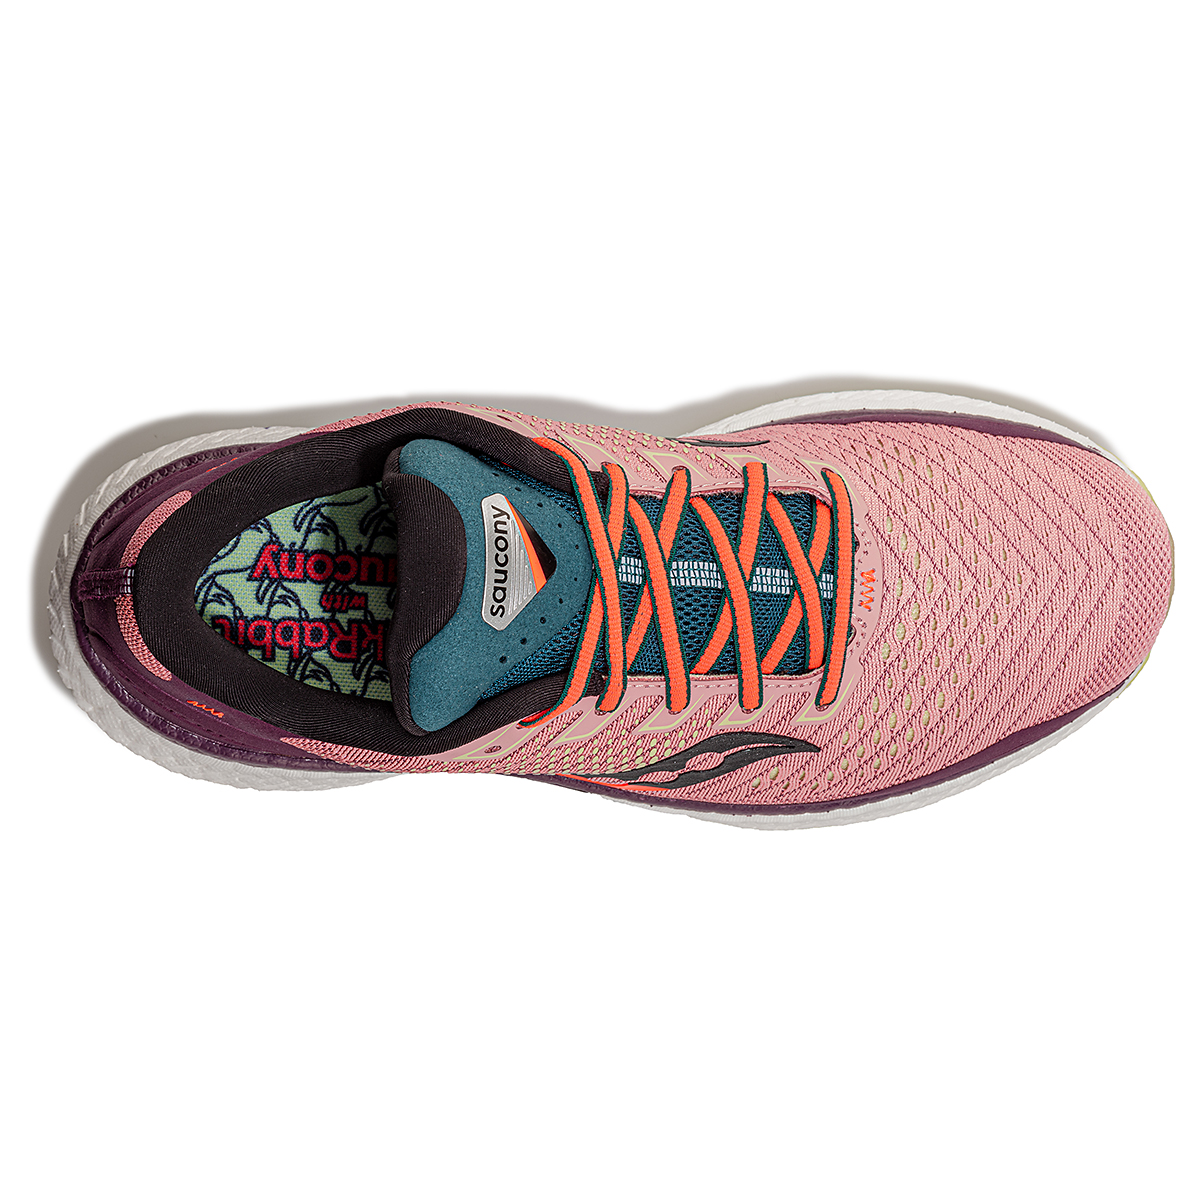 Women's Saucony Jackalope 2.0 Triumph 18 Running Shoe - Color: Jackalope - Size: 5 - Width: Regular, Jackalope, large, image 2